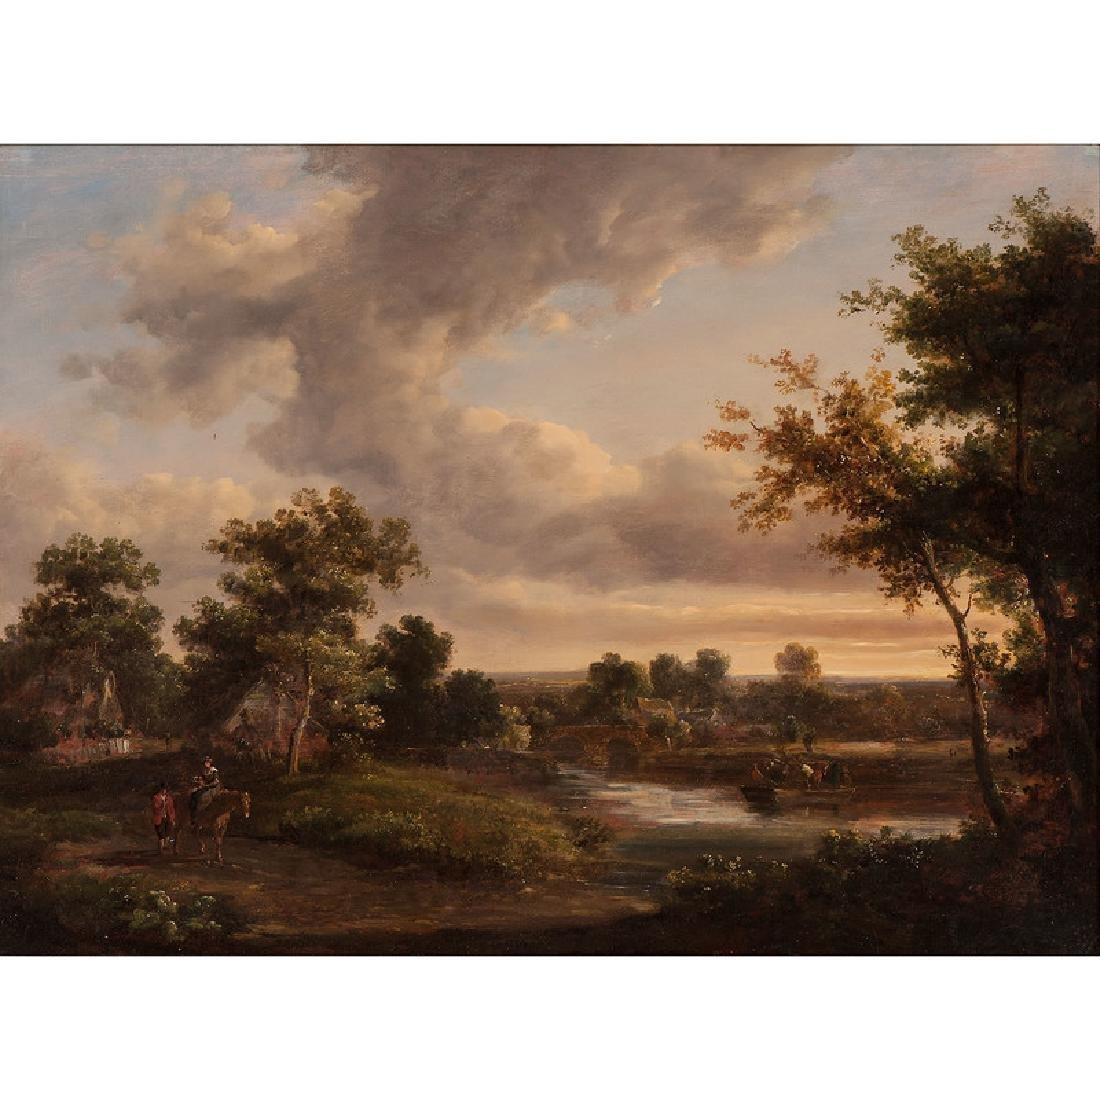 Charles Towne (English, 1763-1840)